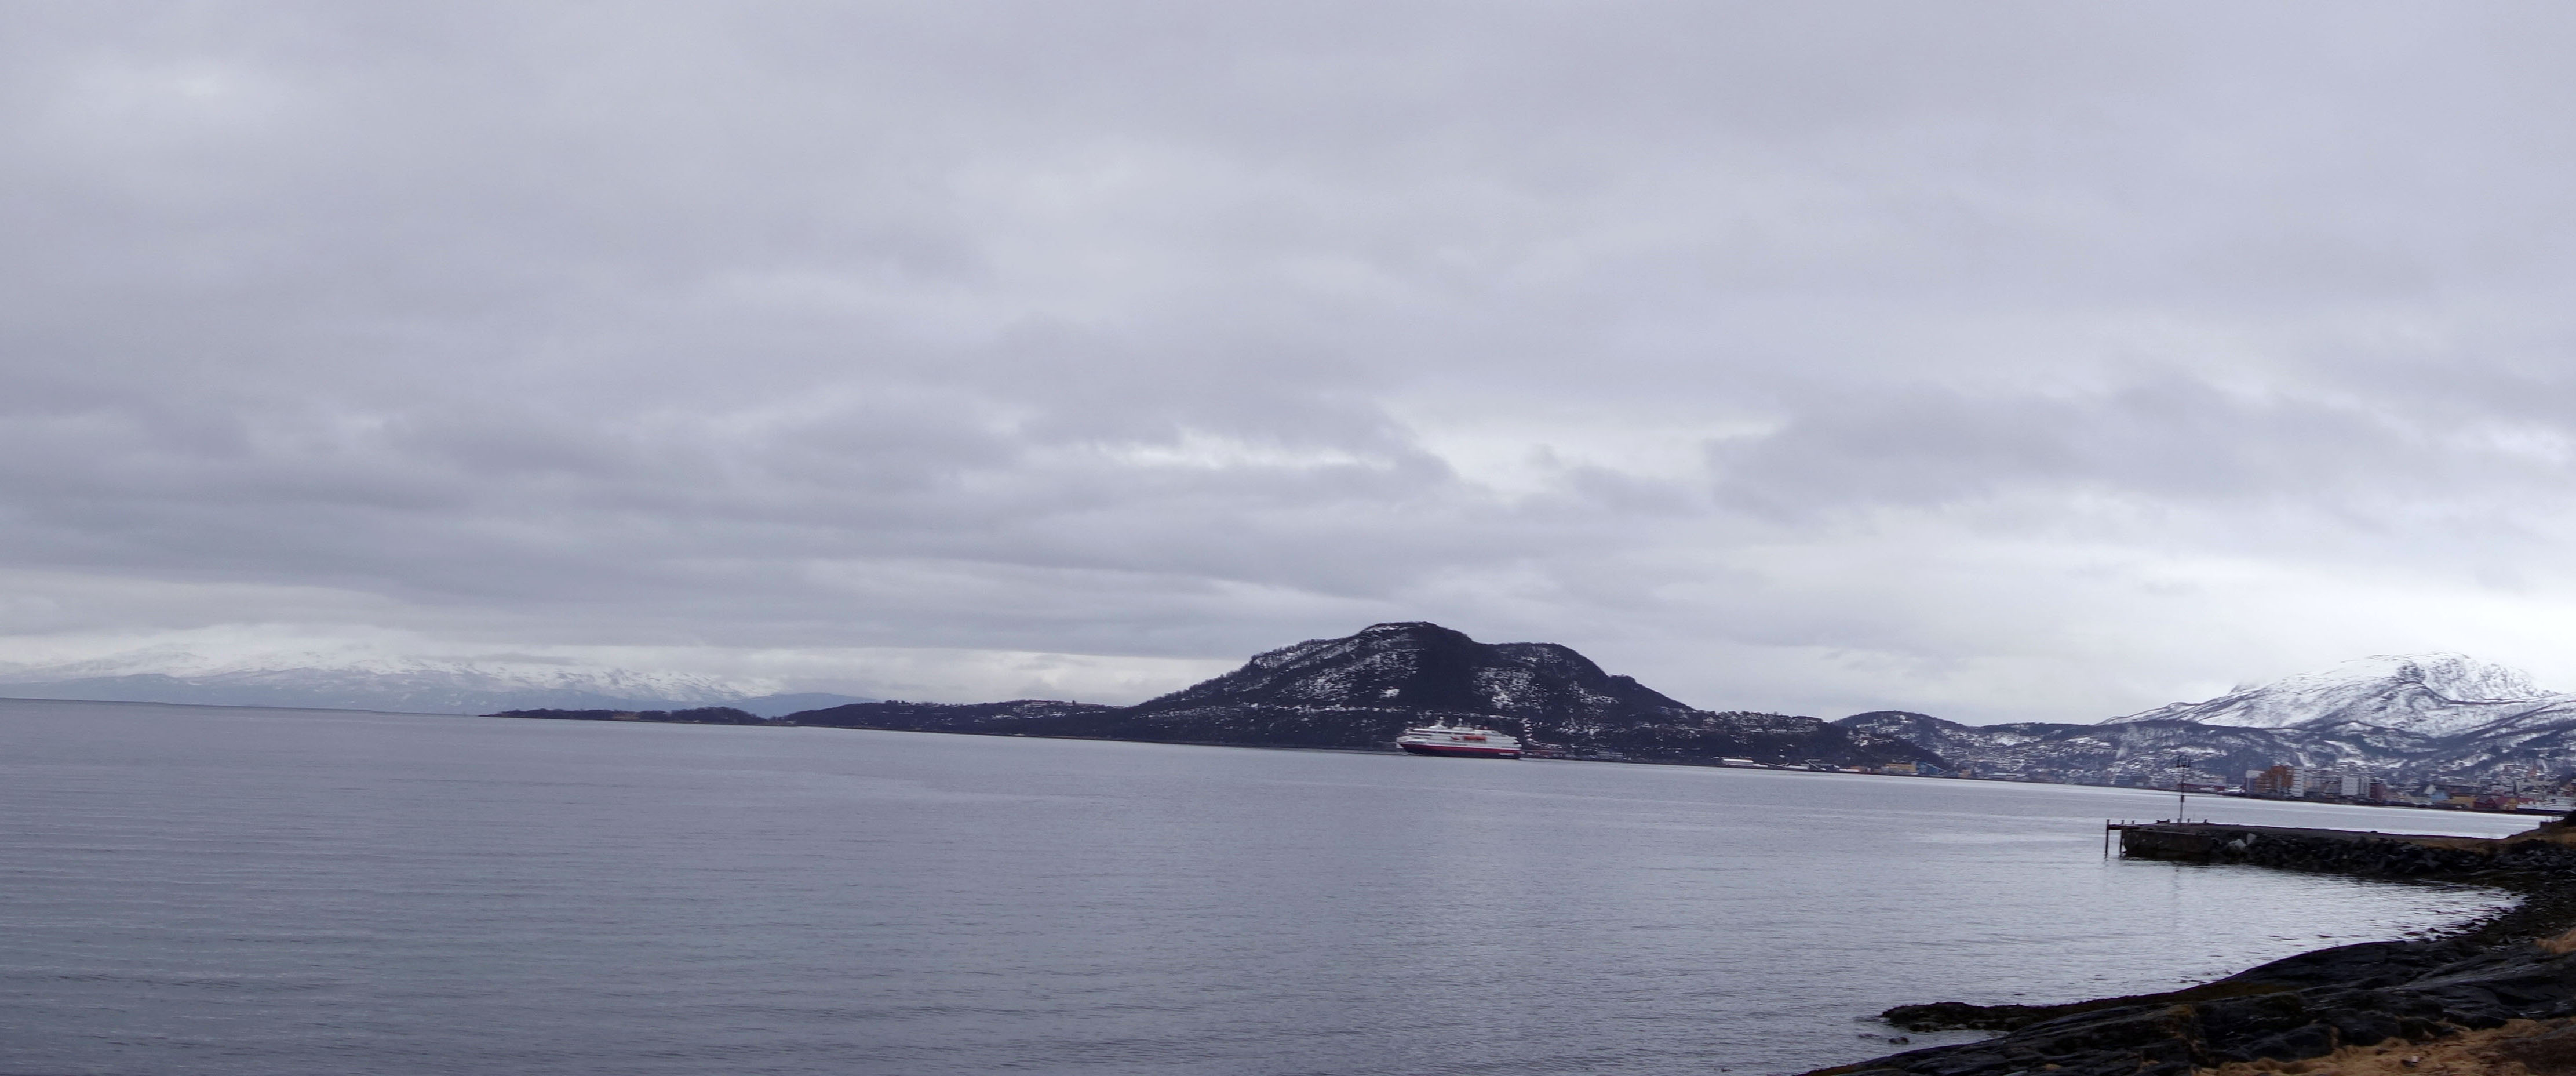 Hurtigruten93web